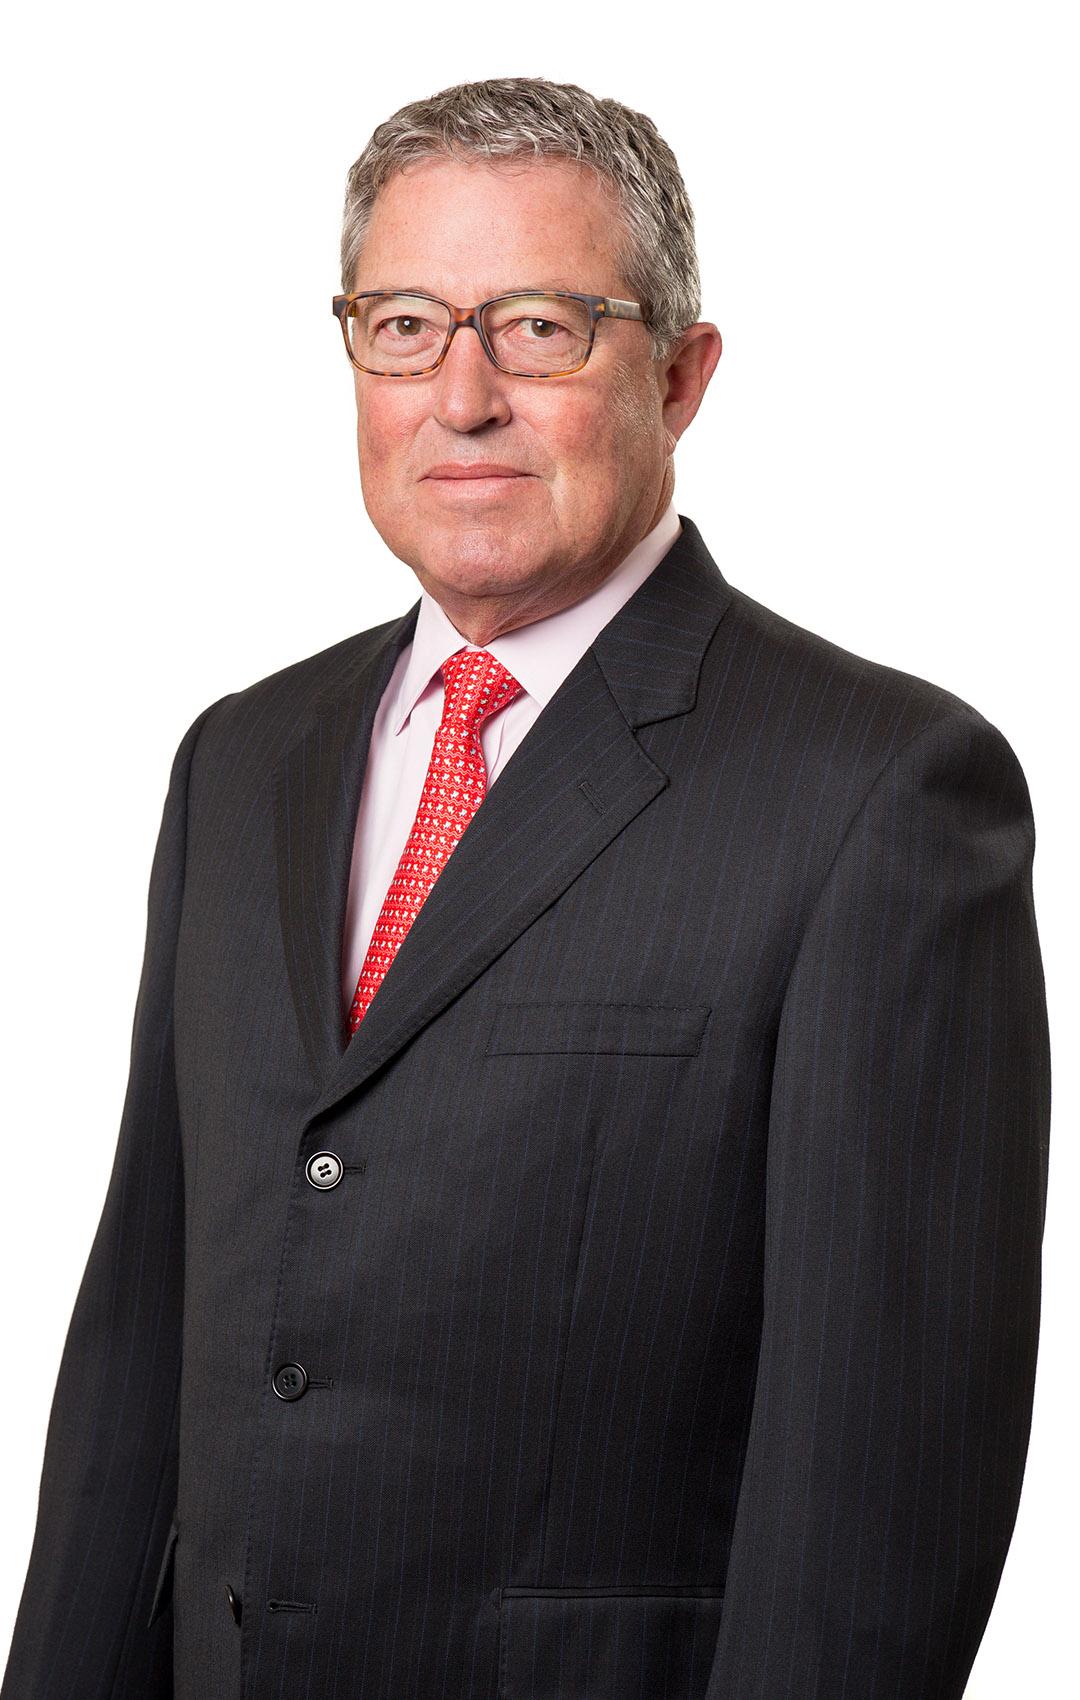 Clifford I. Hertz